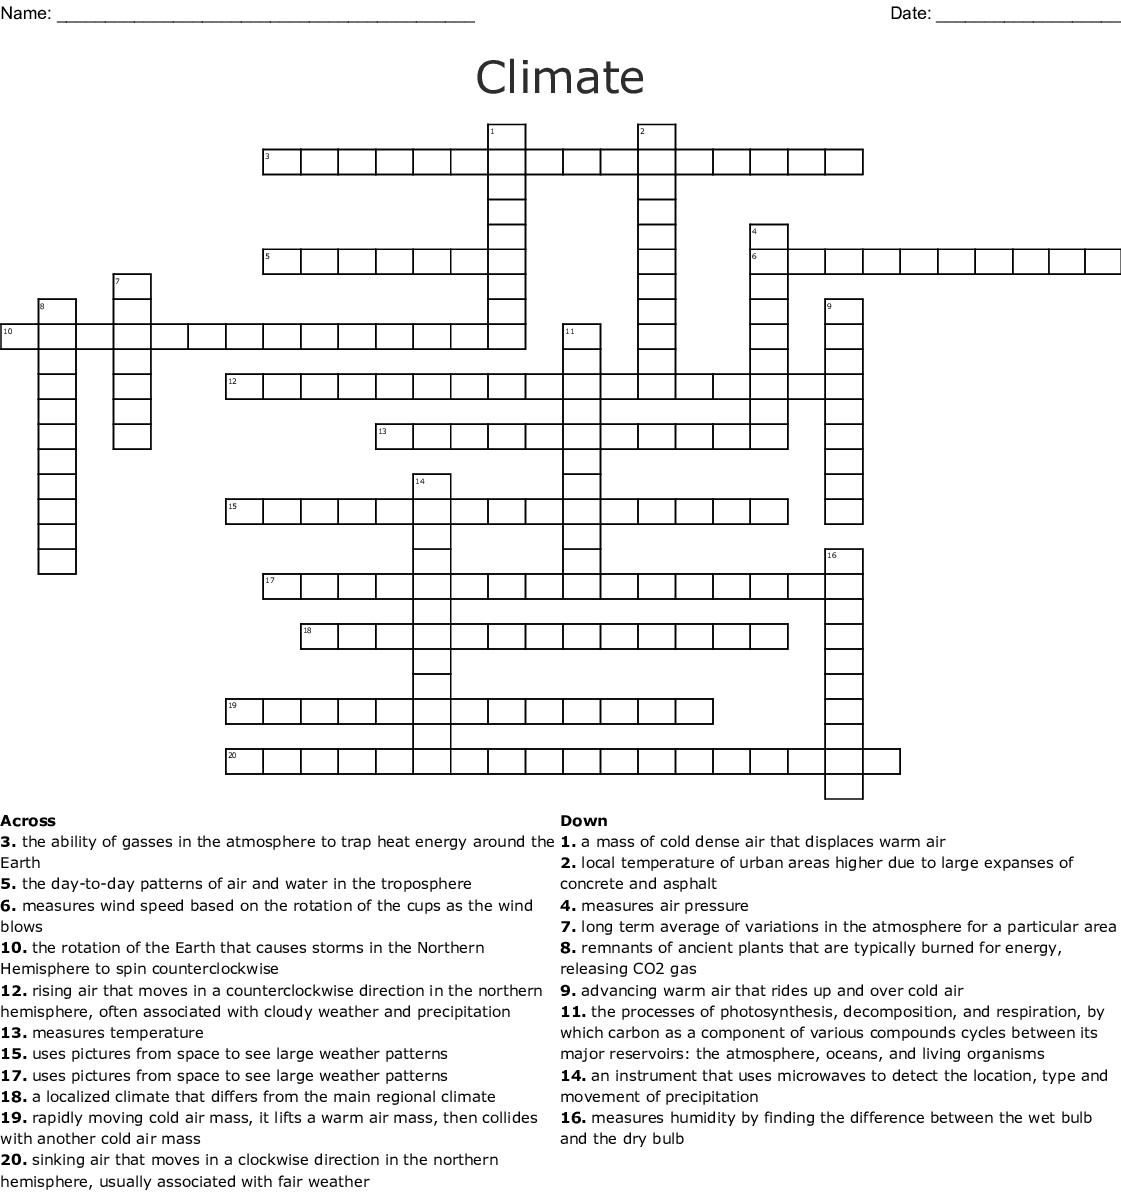 Climate Crossword